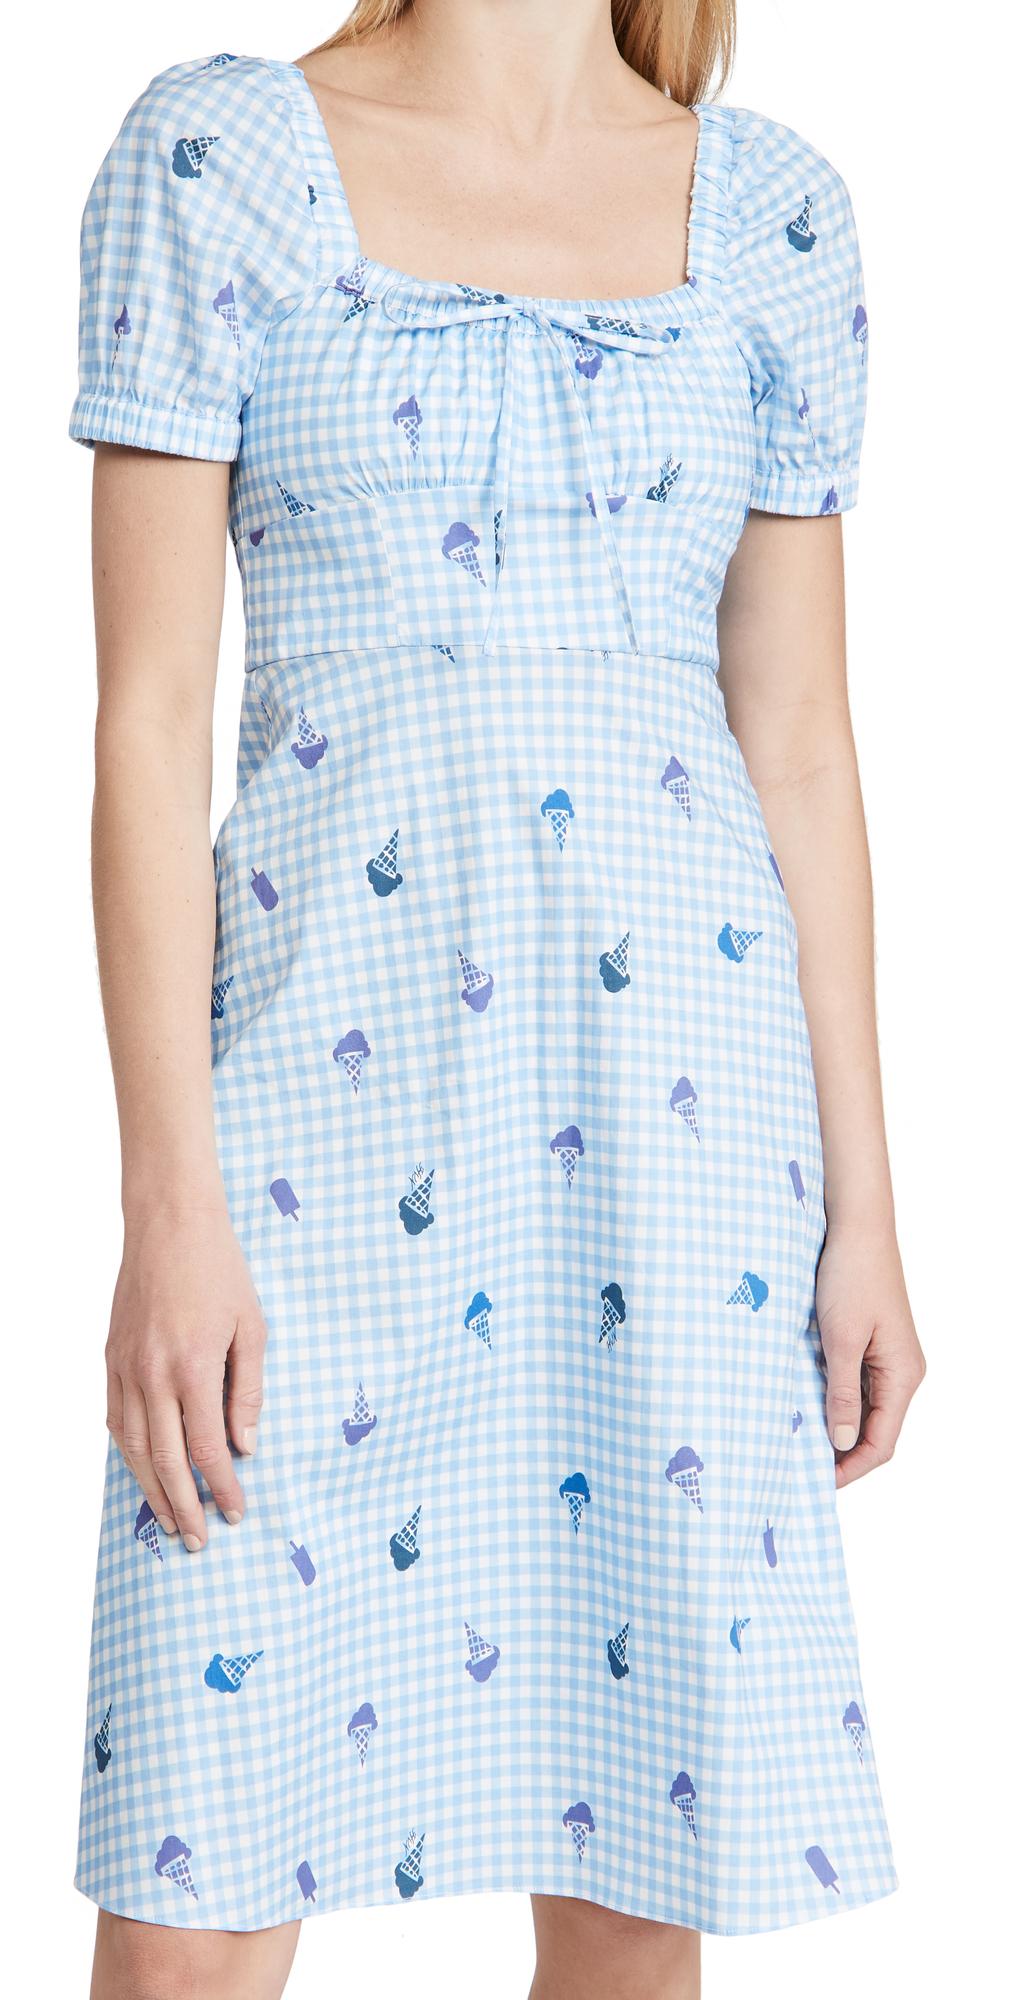 Holland Bow Tie Cotton Dress